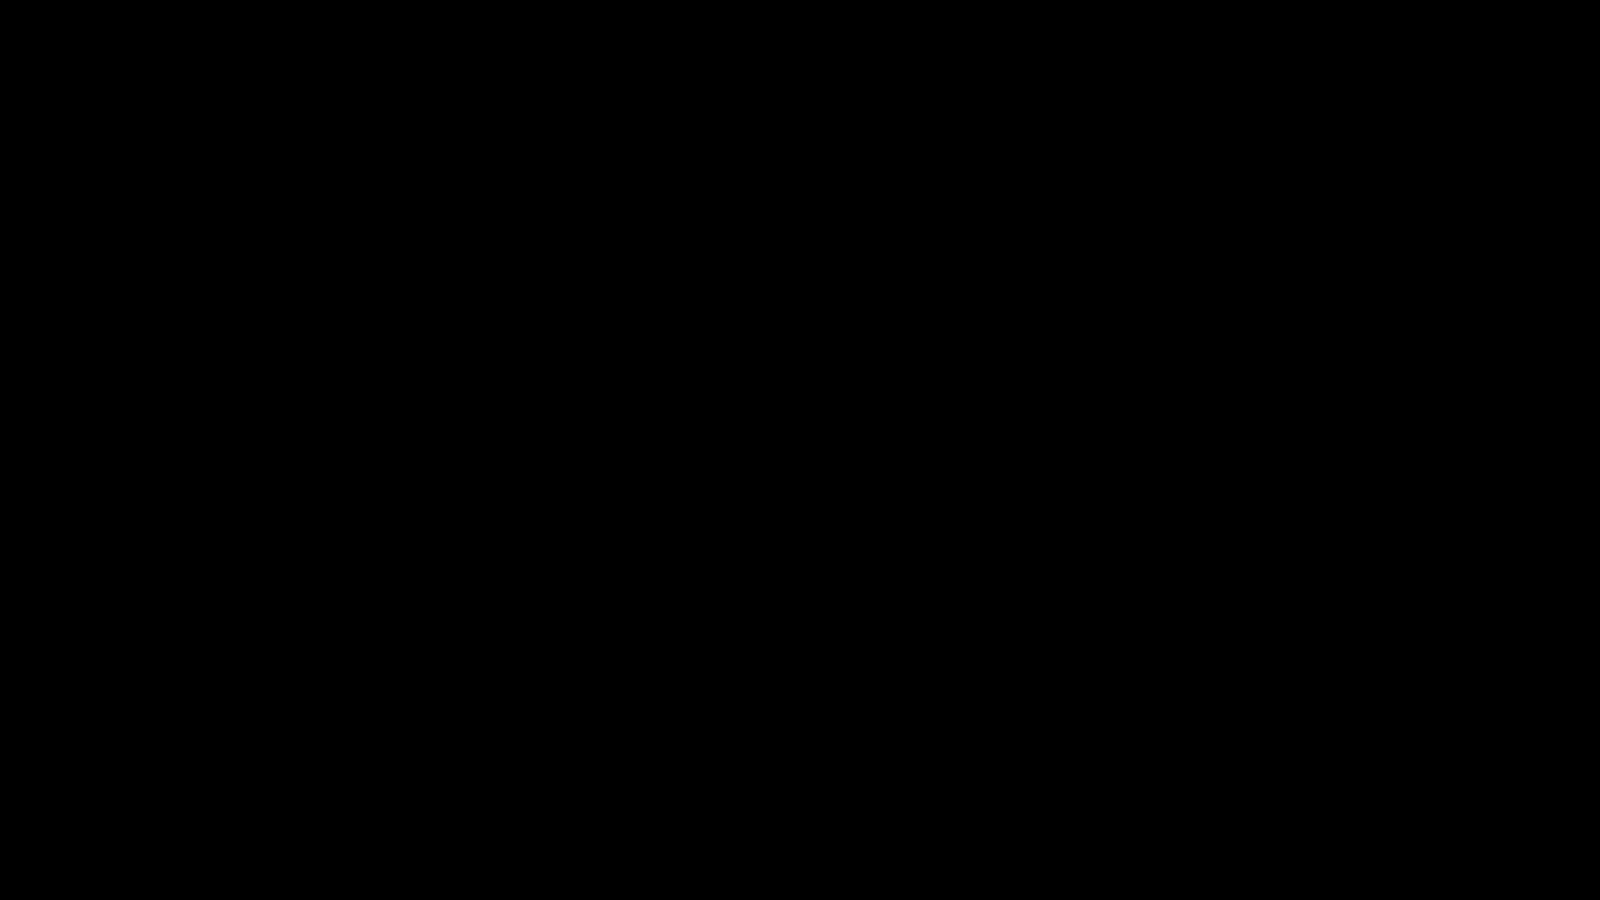 Overzicht font Merriweather